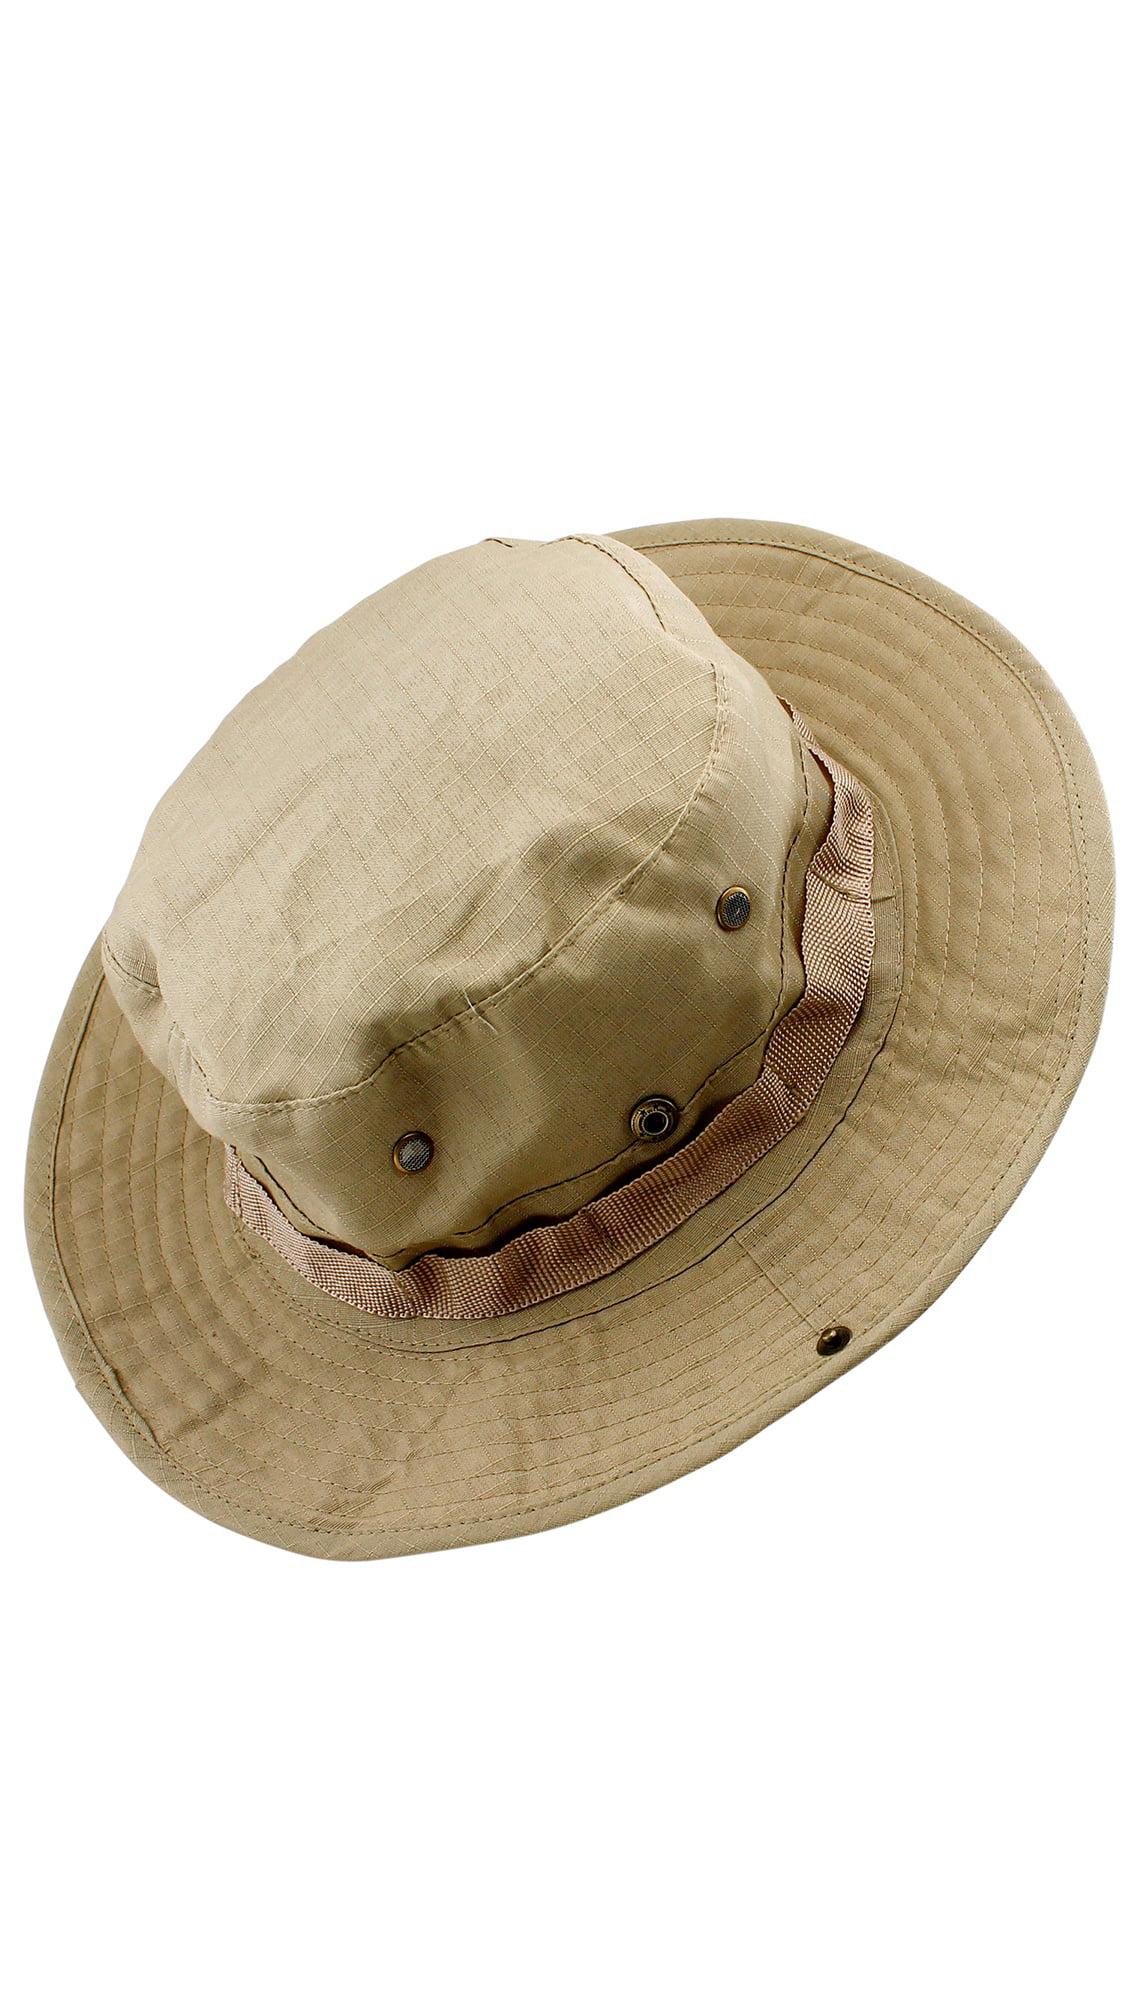 Fishing Hunting Bucket Hat Boonie Outdoor Cap Washed Cotton Safari ...